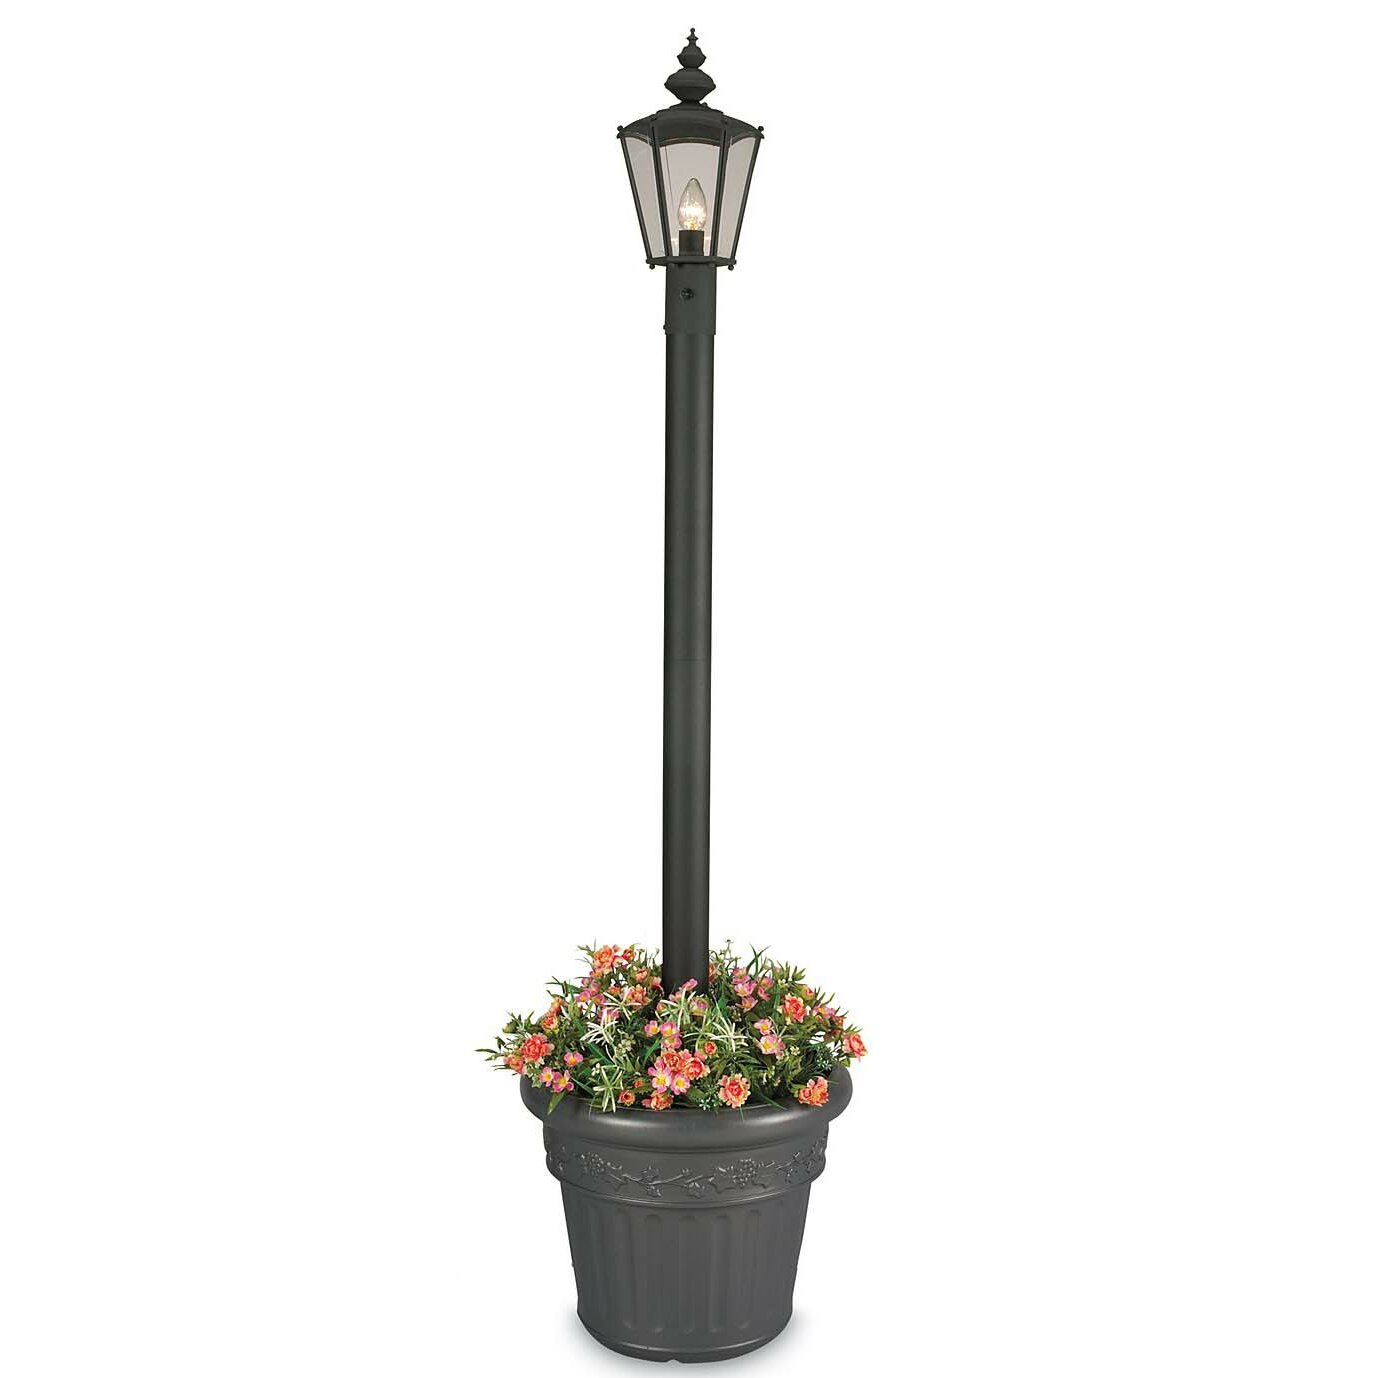 Patio living concepts cambridge 1 light 80 outdoor post for Outdoor lighting concepts